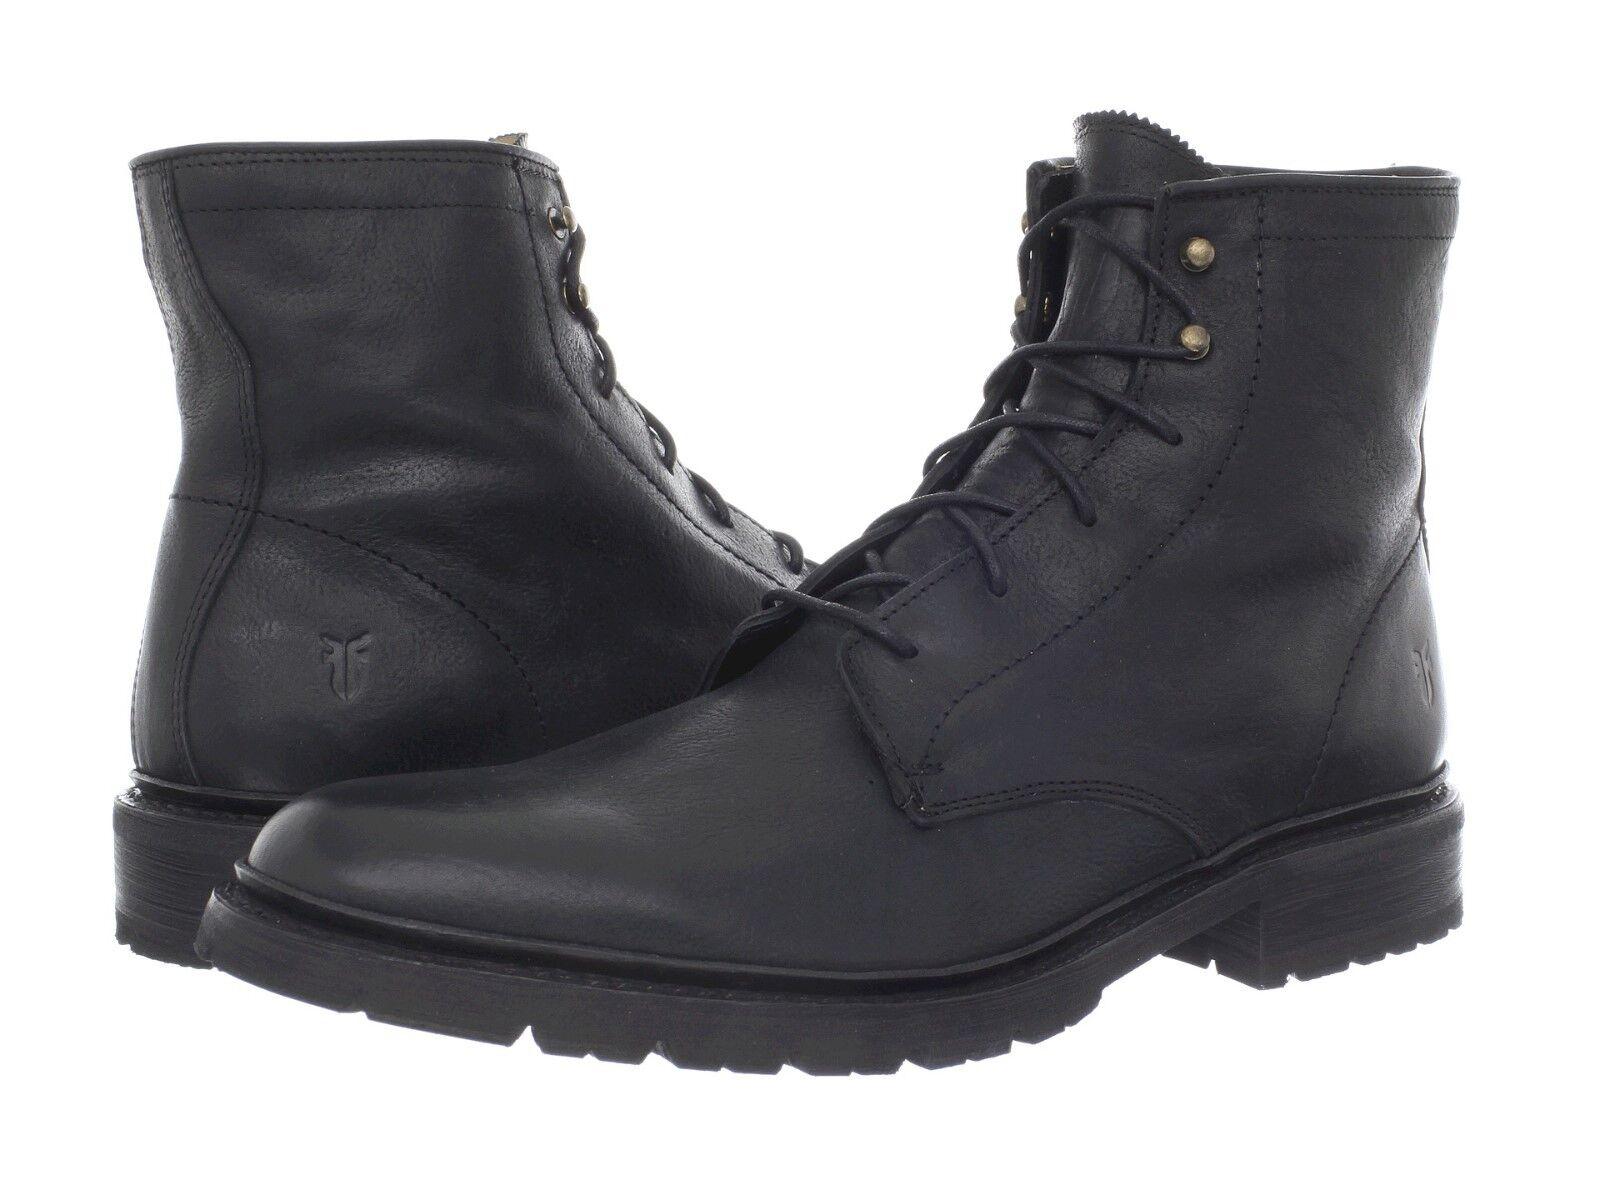 Men's Frye James Lug Lace Up avvio nero Hammerosso Full Grain Leather 87931 BLK